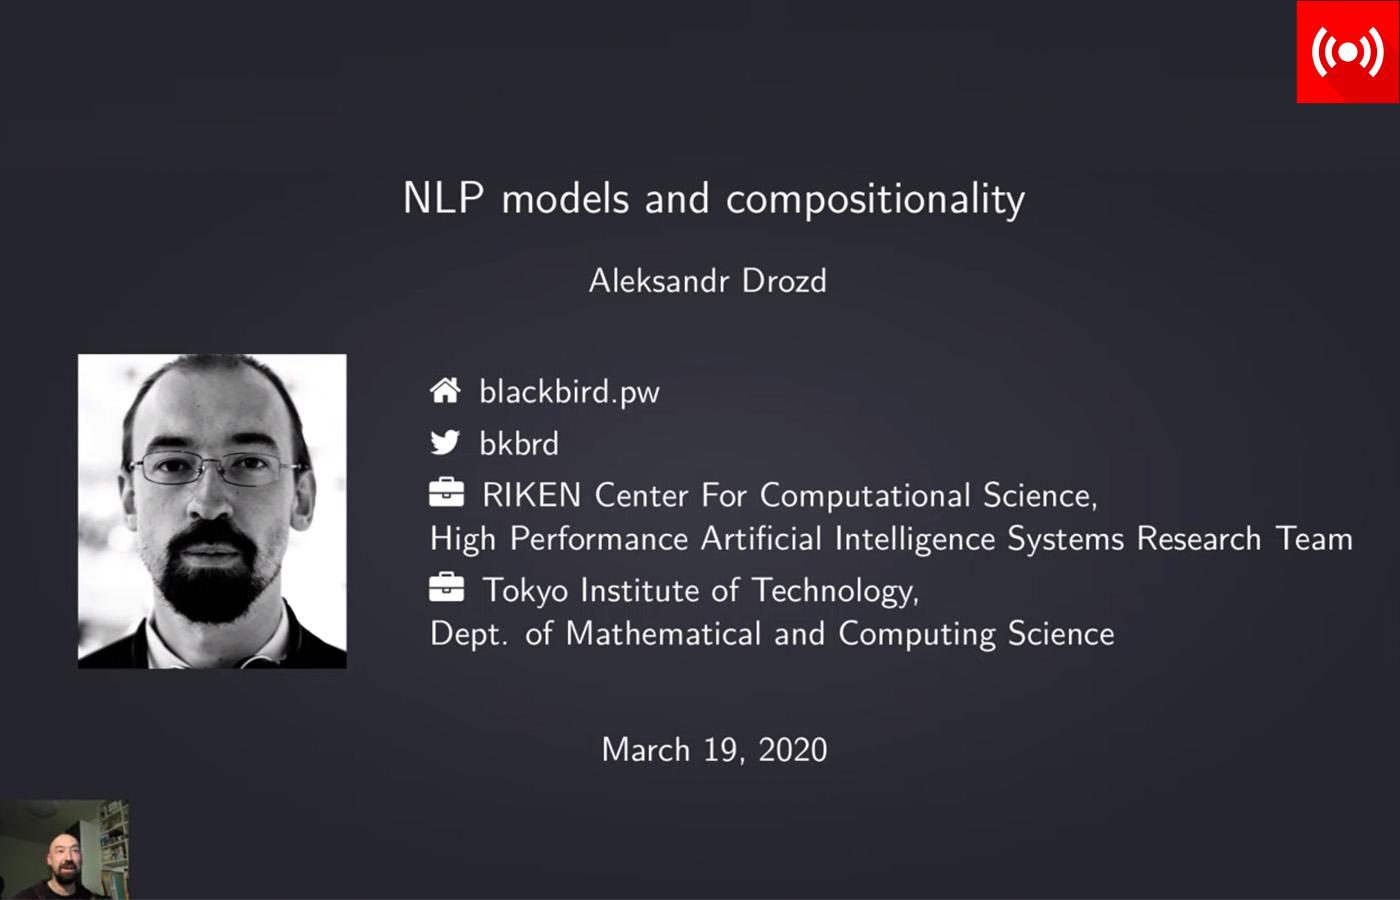 Dr. Aleksandr Drozd presenting via YouTube Live